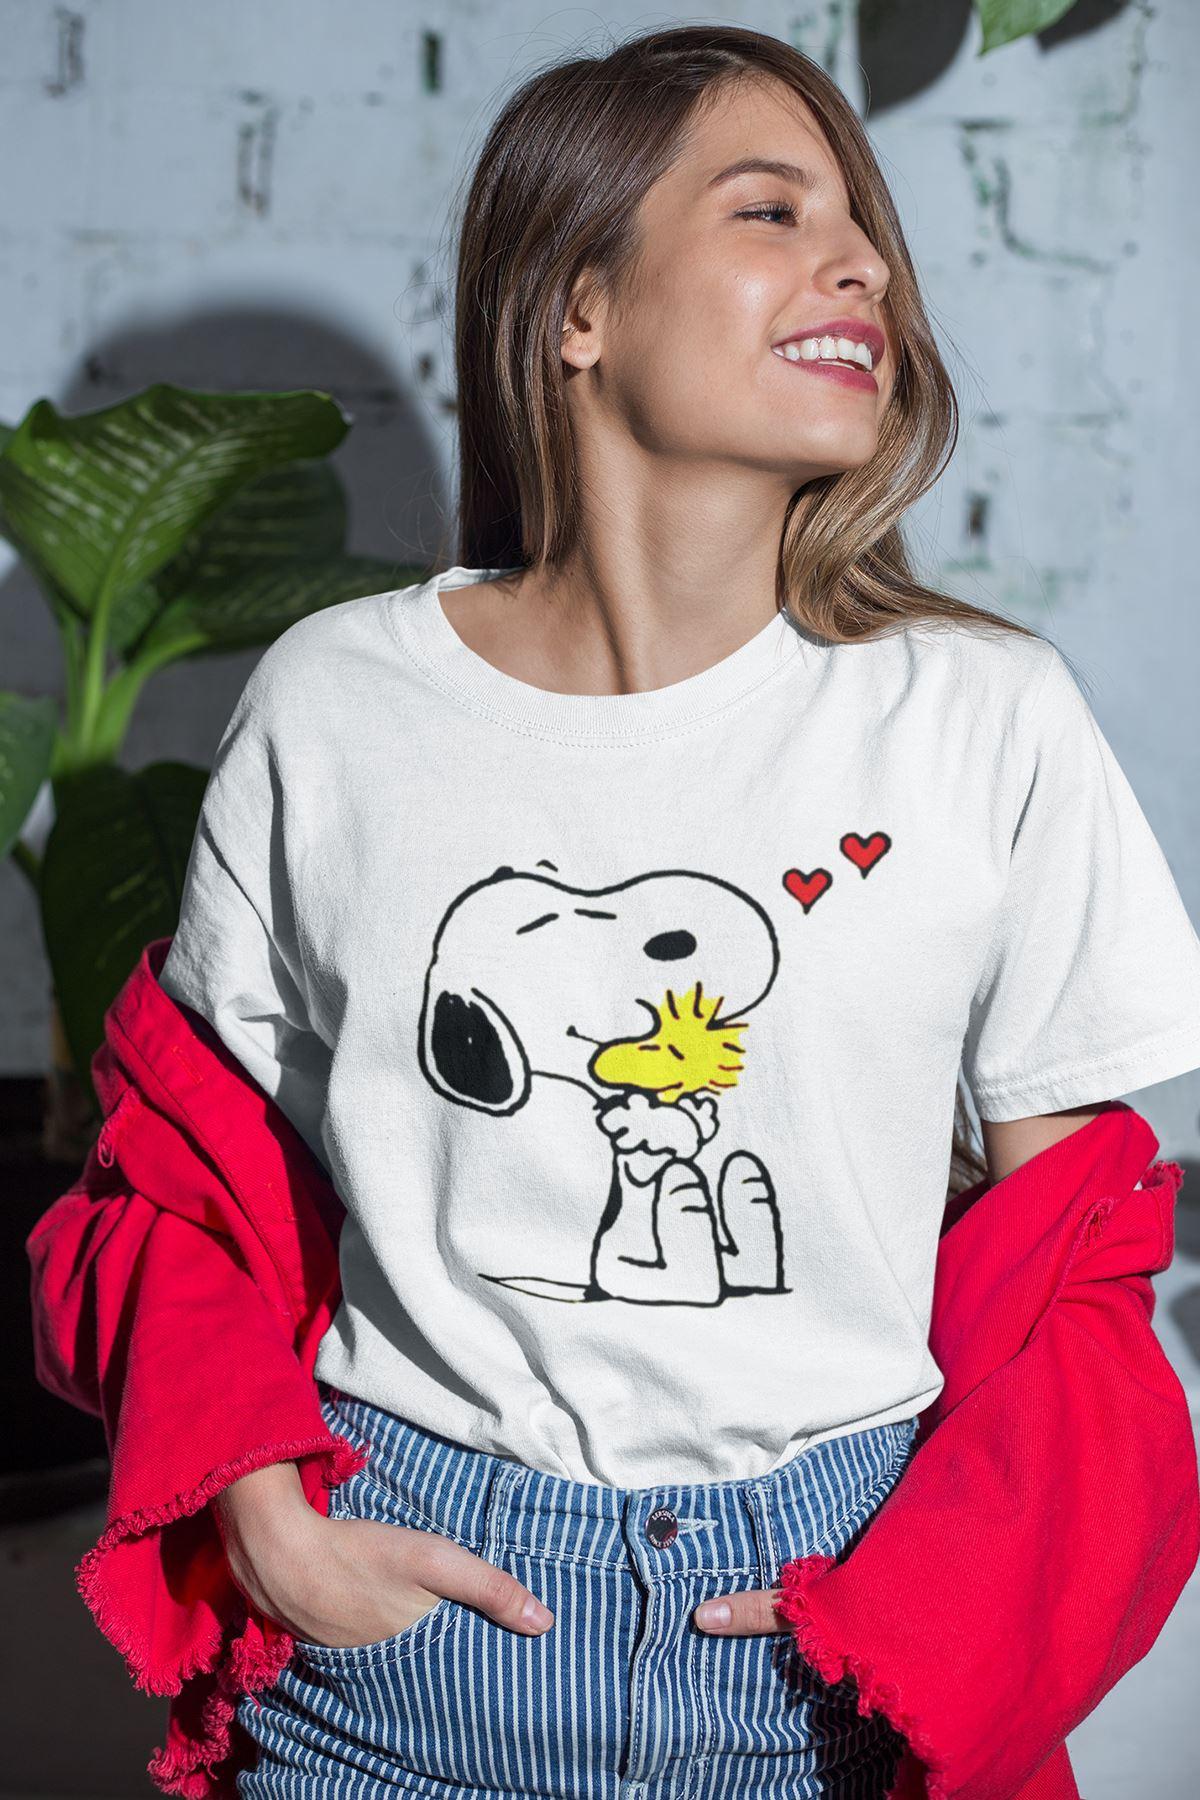 Snoppy Beyaz Outdoor Kadın Tshirt - Tişört